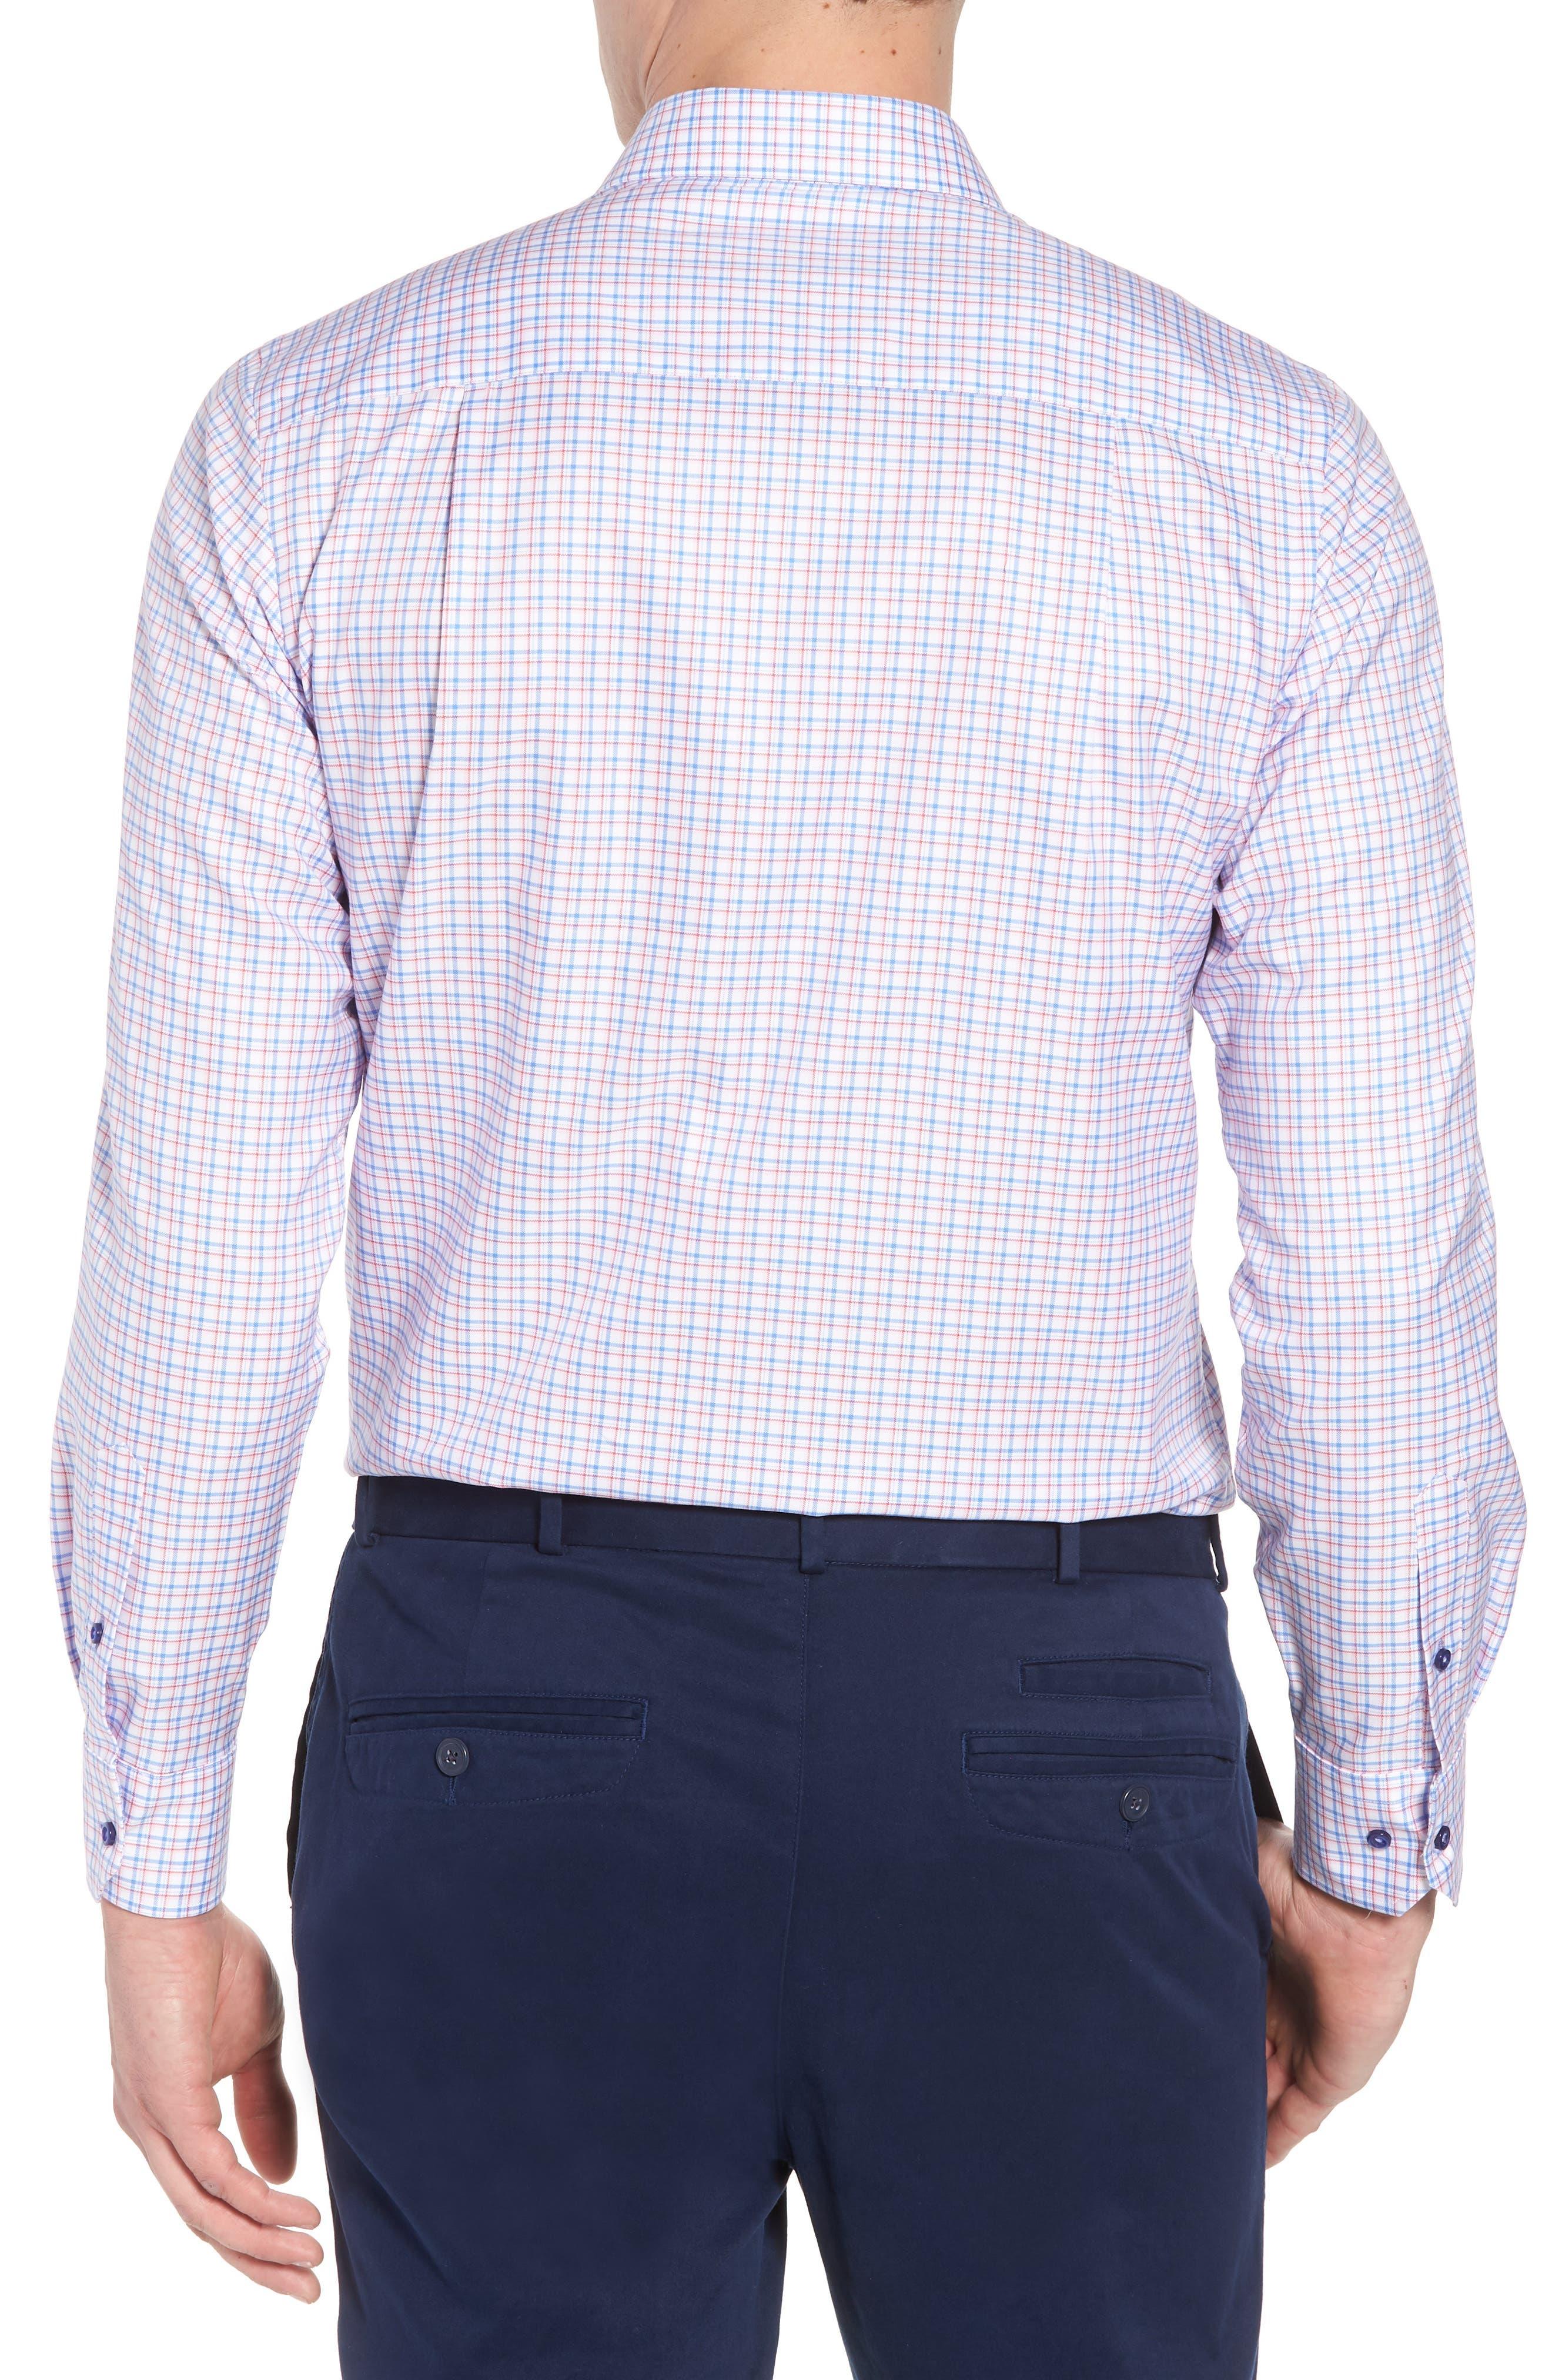 Regular Fit Check Sport Shirt,                             Alternate thumbnail 2, color,                             Blue/ Pink